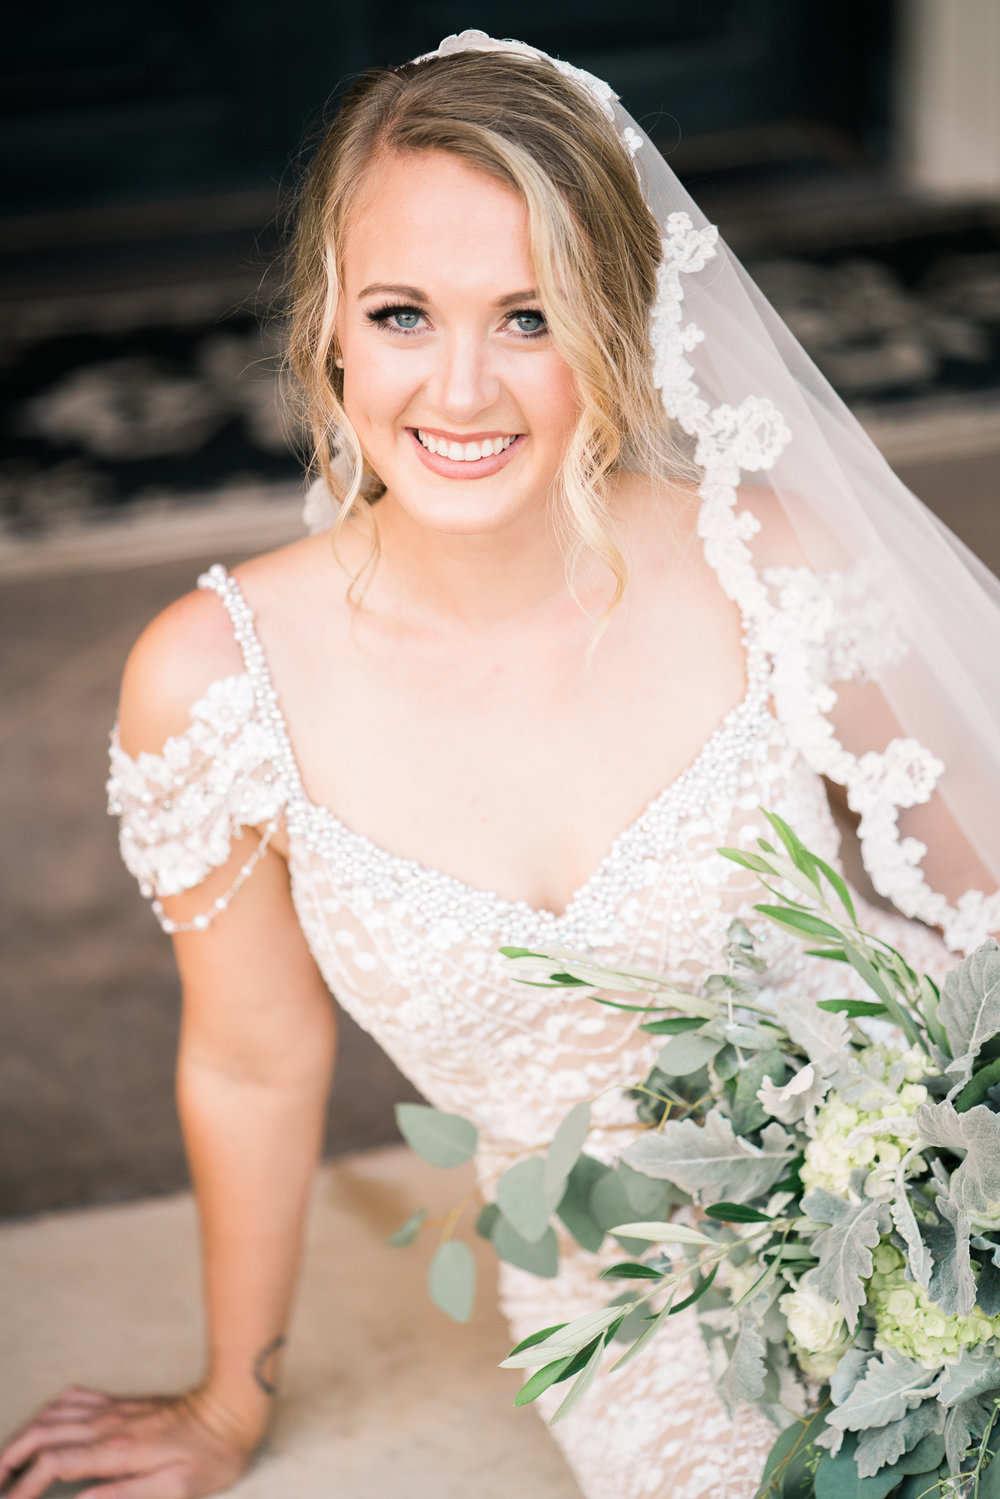 Clytee-Bridal-Portraits-Web-64.jpg